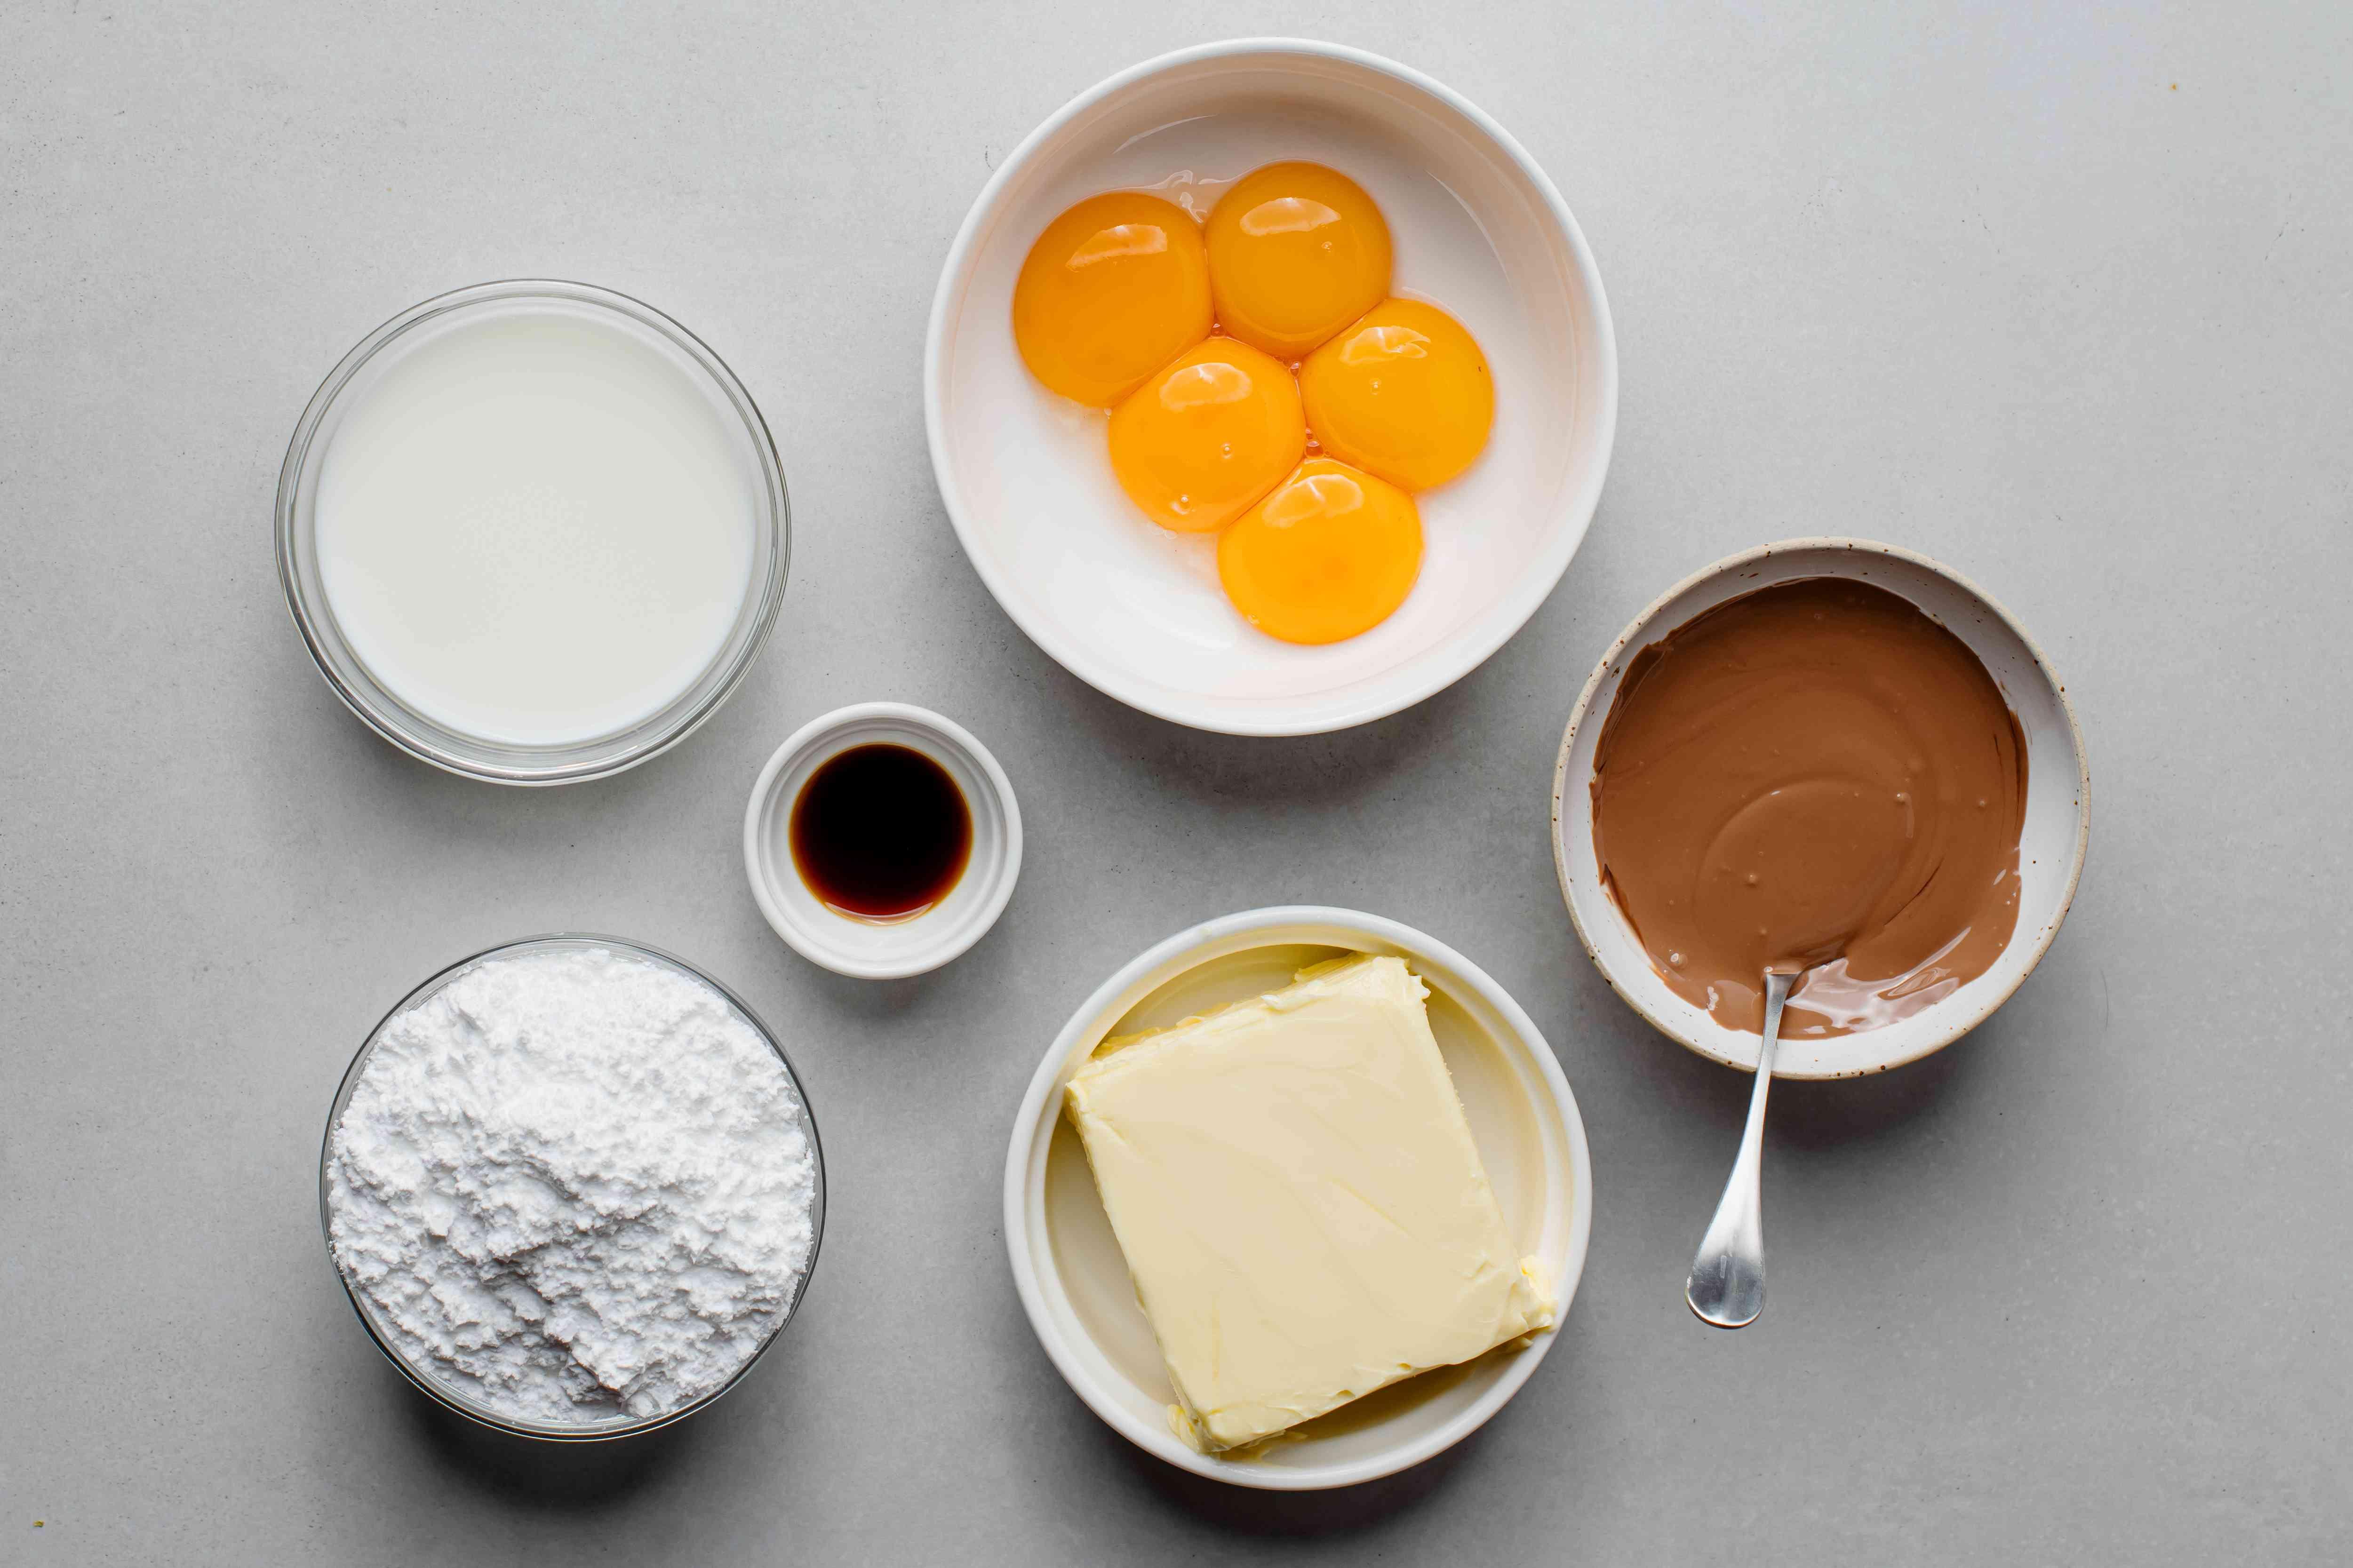 chocolate buttercream ingredients